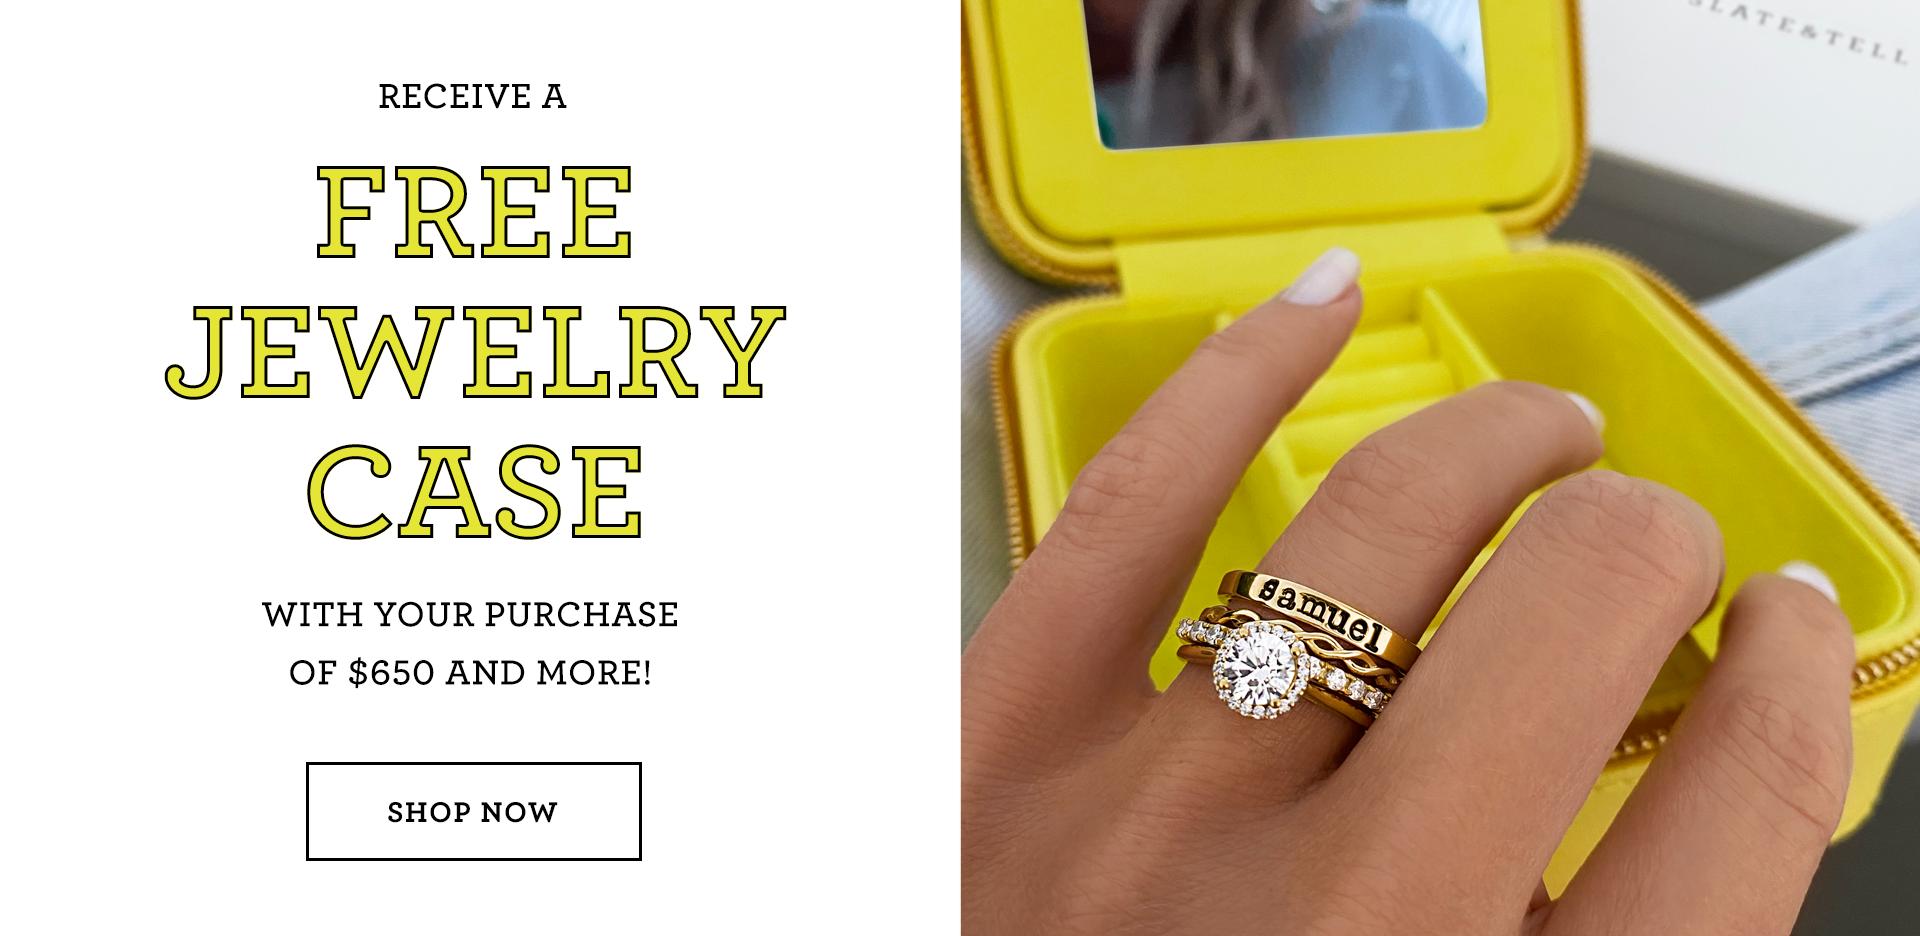 Free Jewelry Case